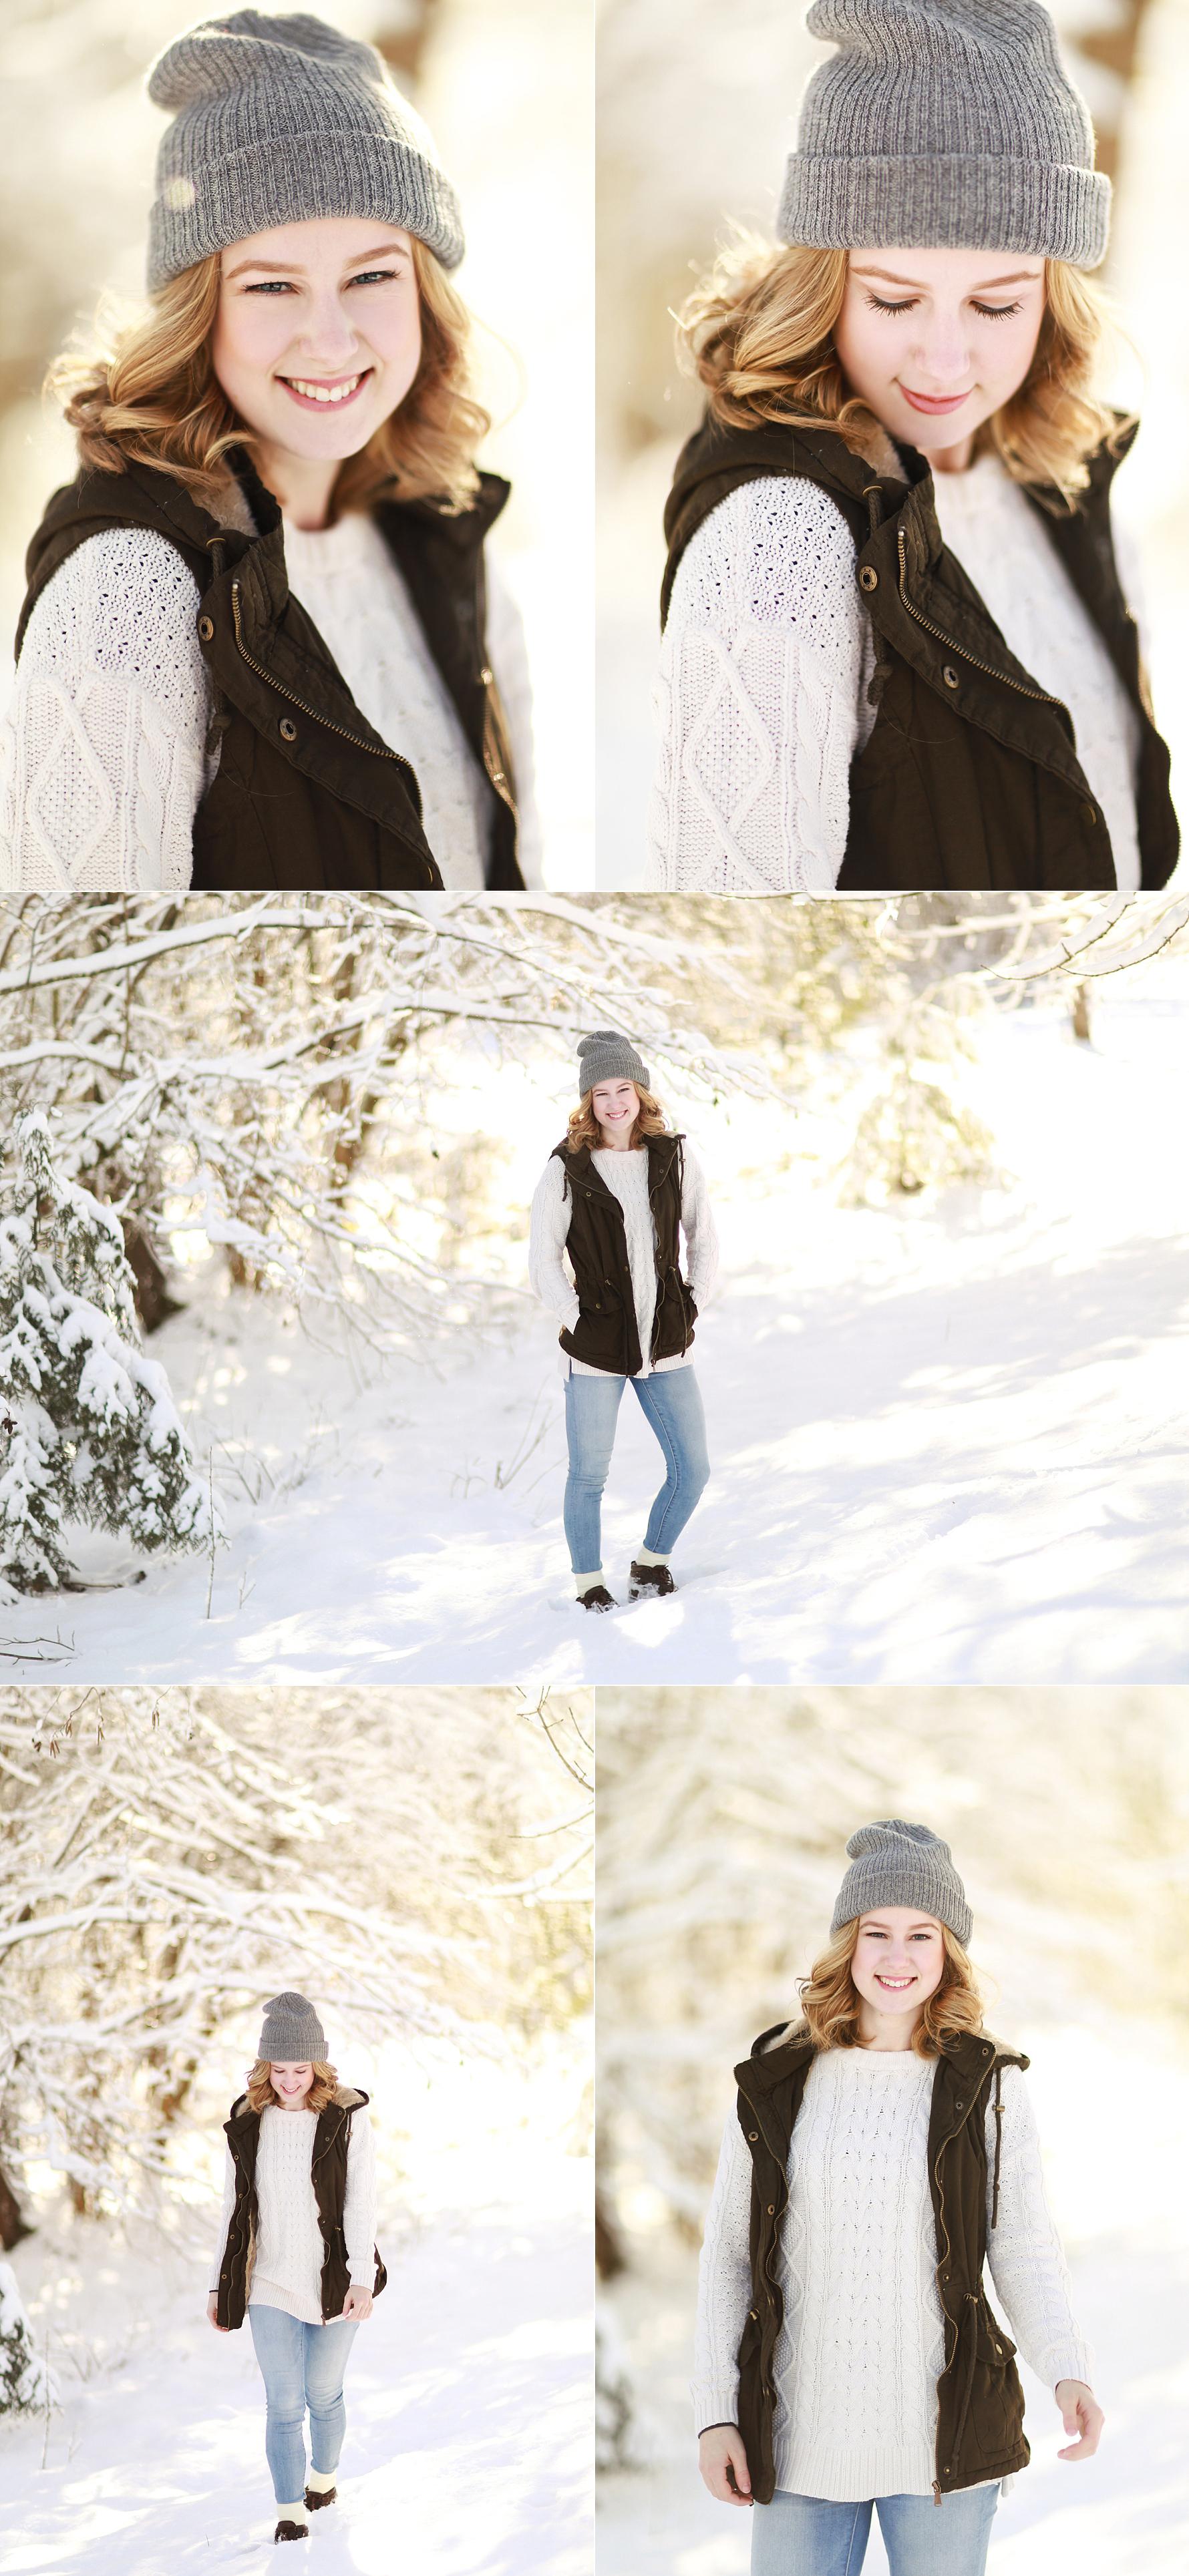 Snow Day!